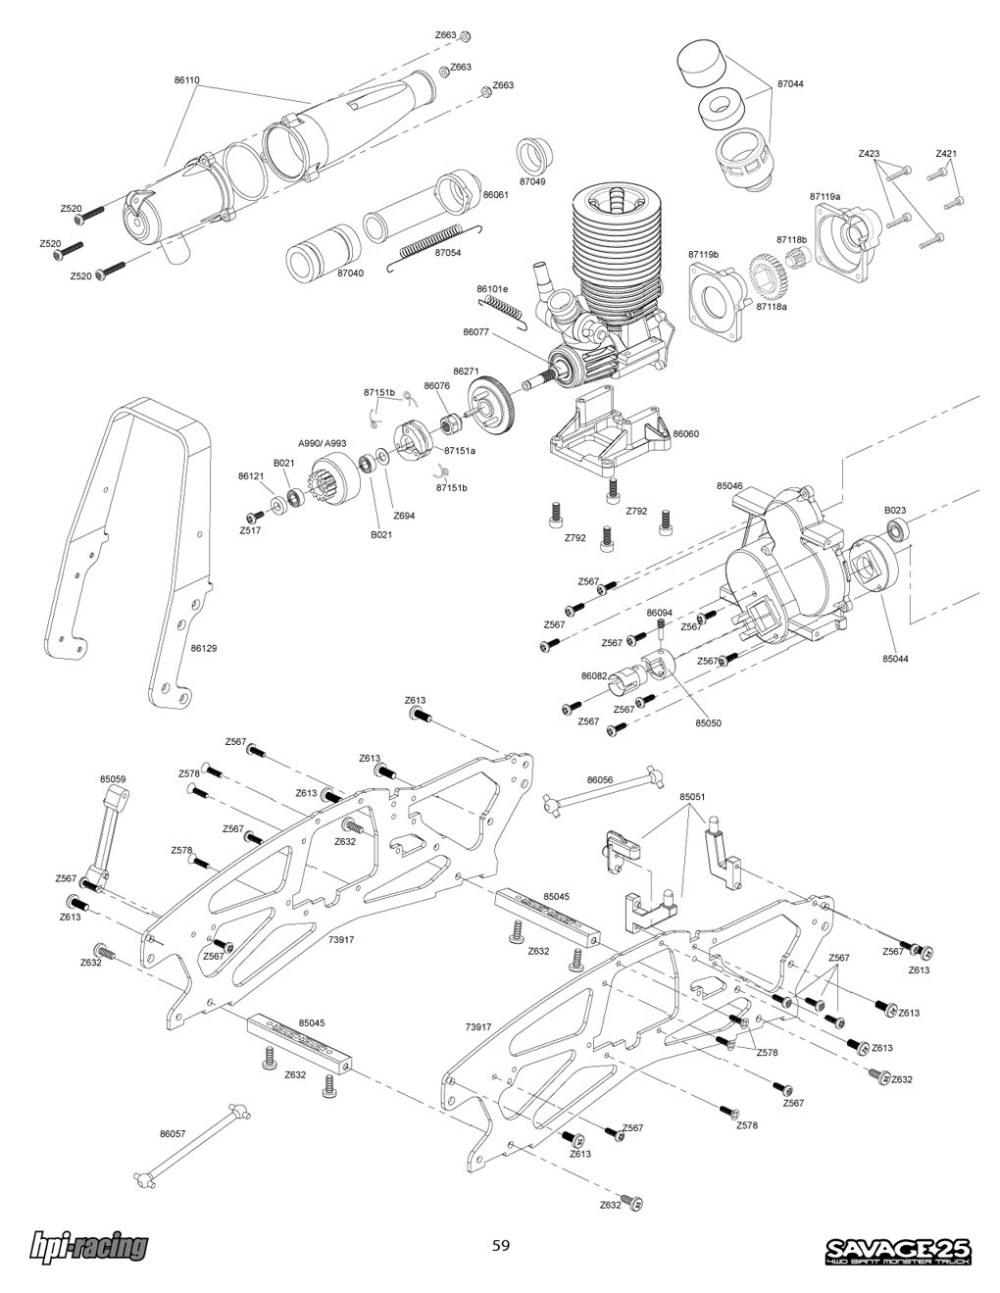 medium resolution of hpi 4 6 max parts diagram blog wiring diagram hpi savage 4 6 parts diagram